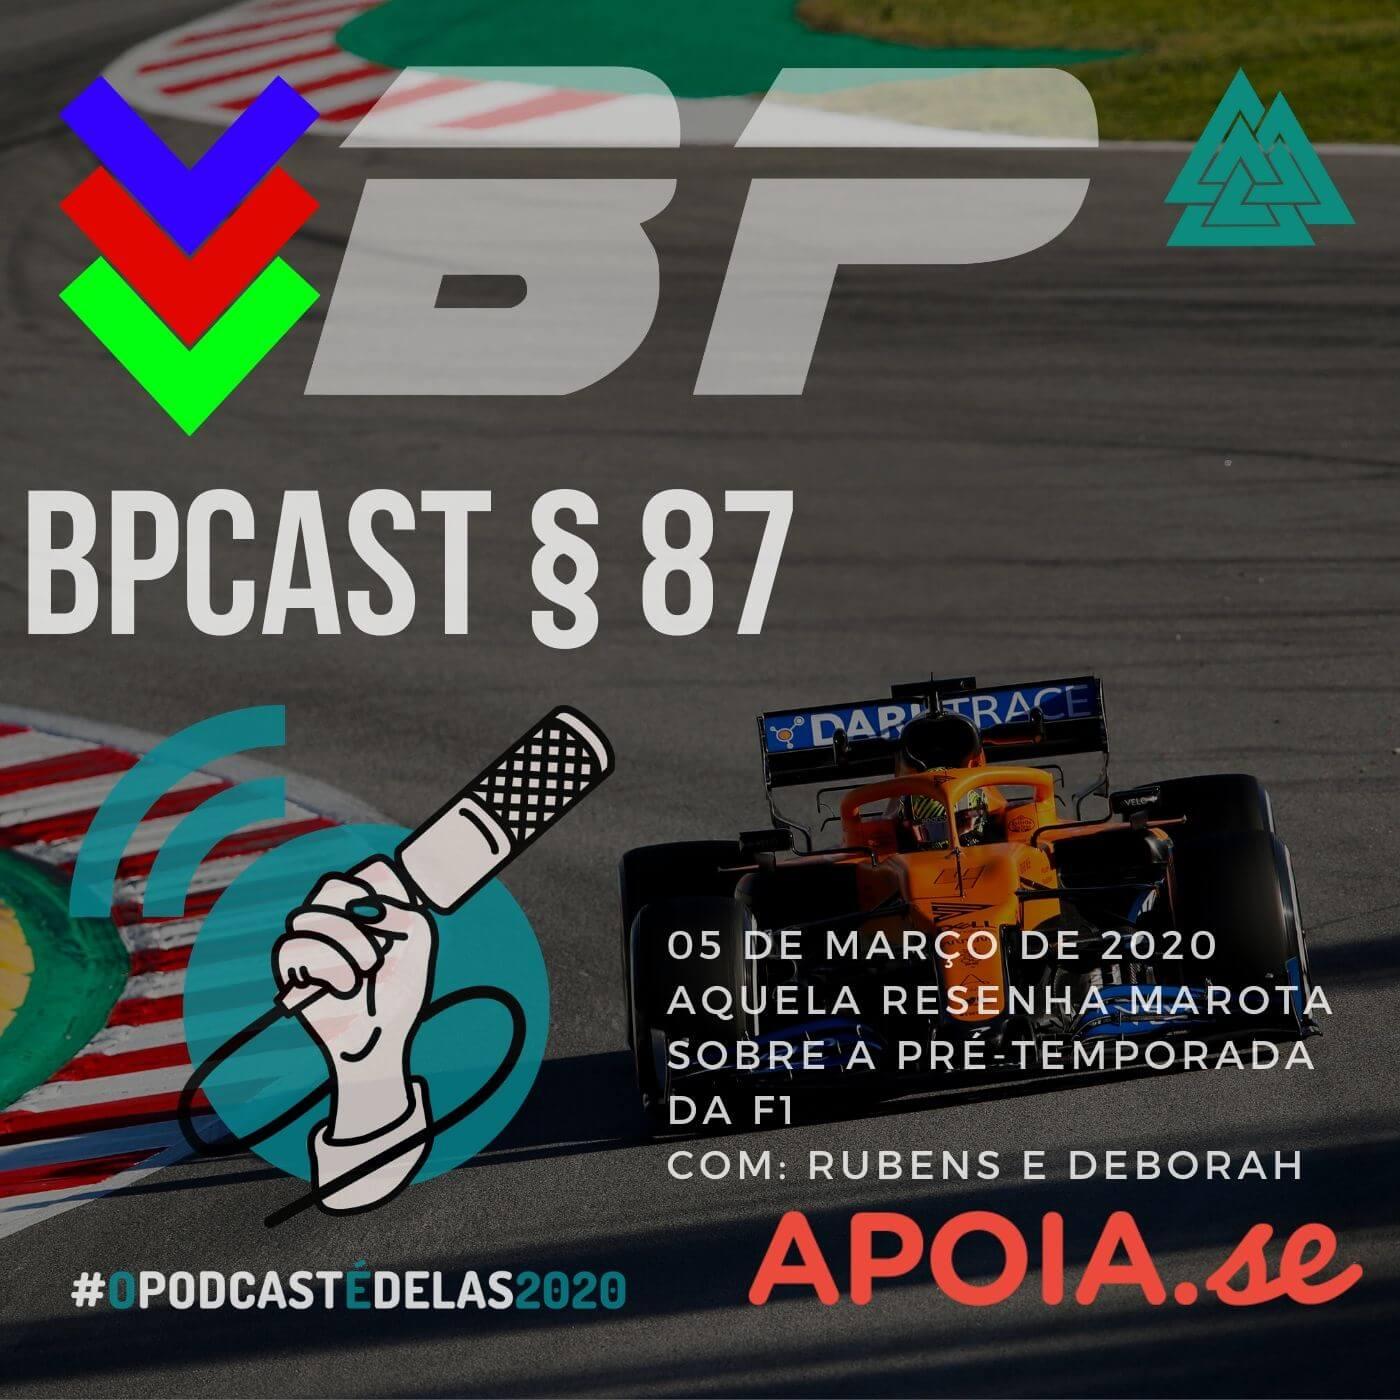 BPCast-87 - Rubens Gomes Passos Netto